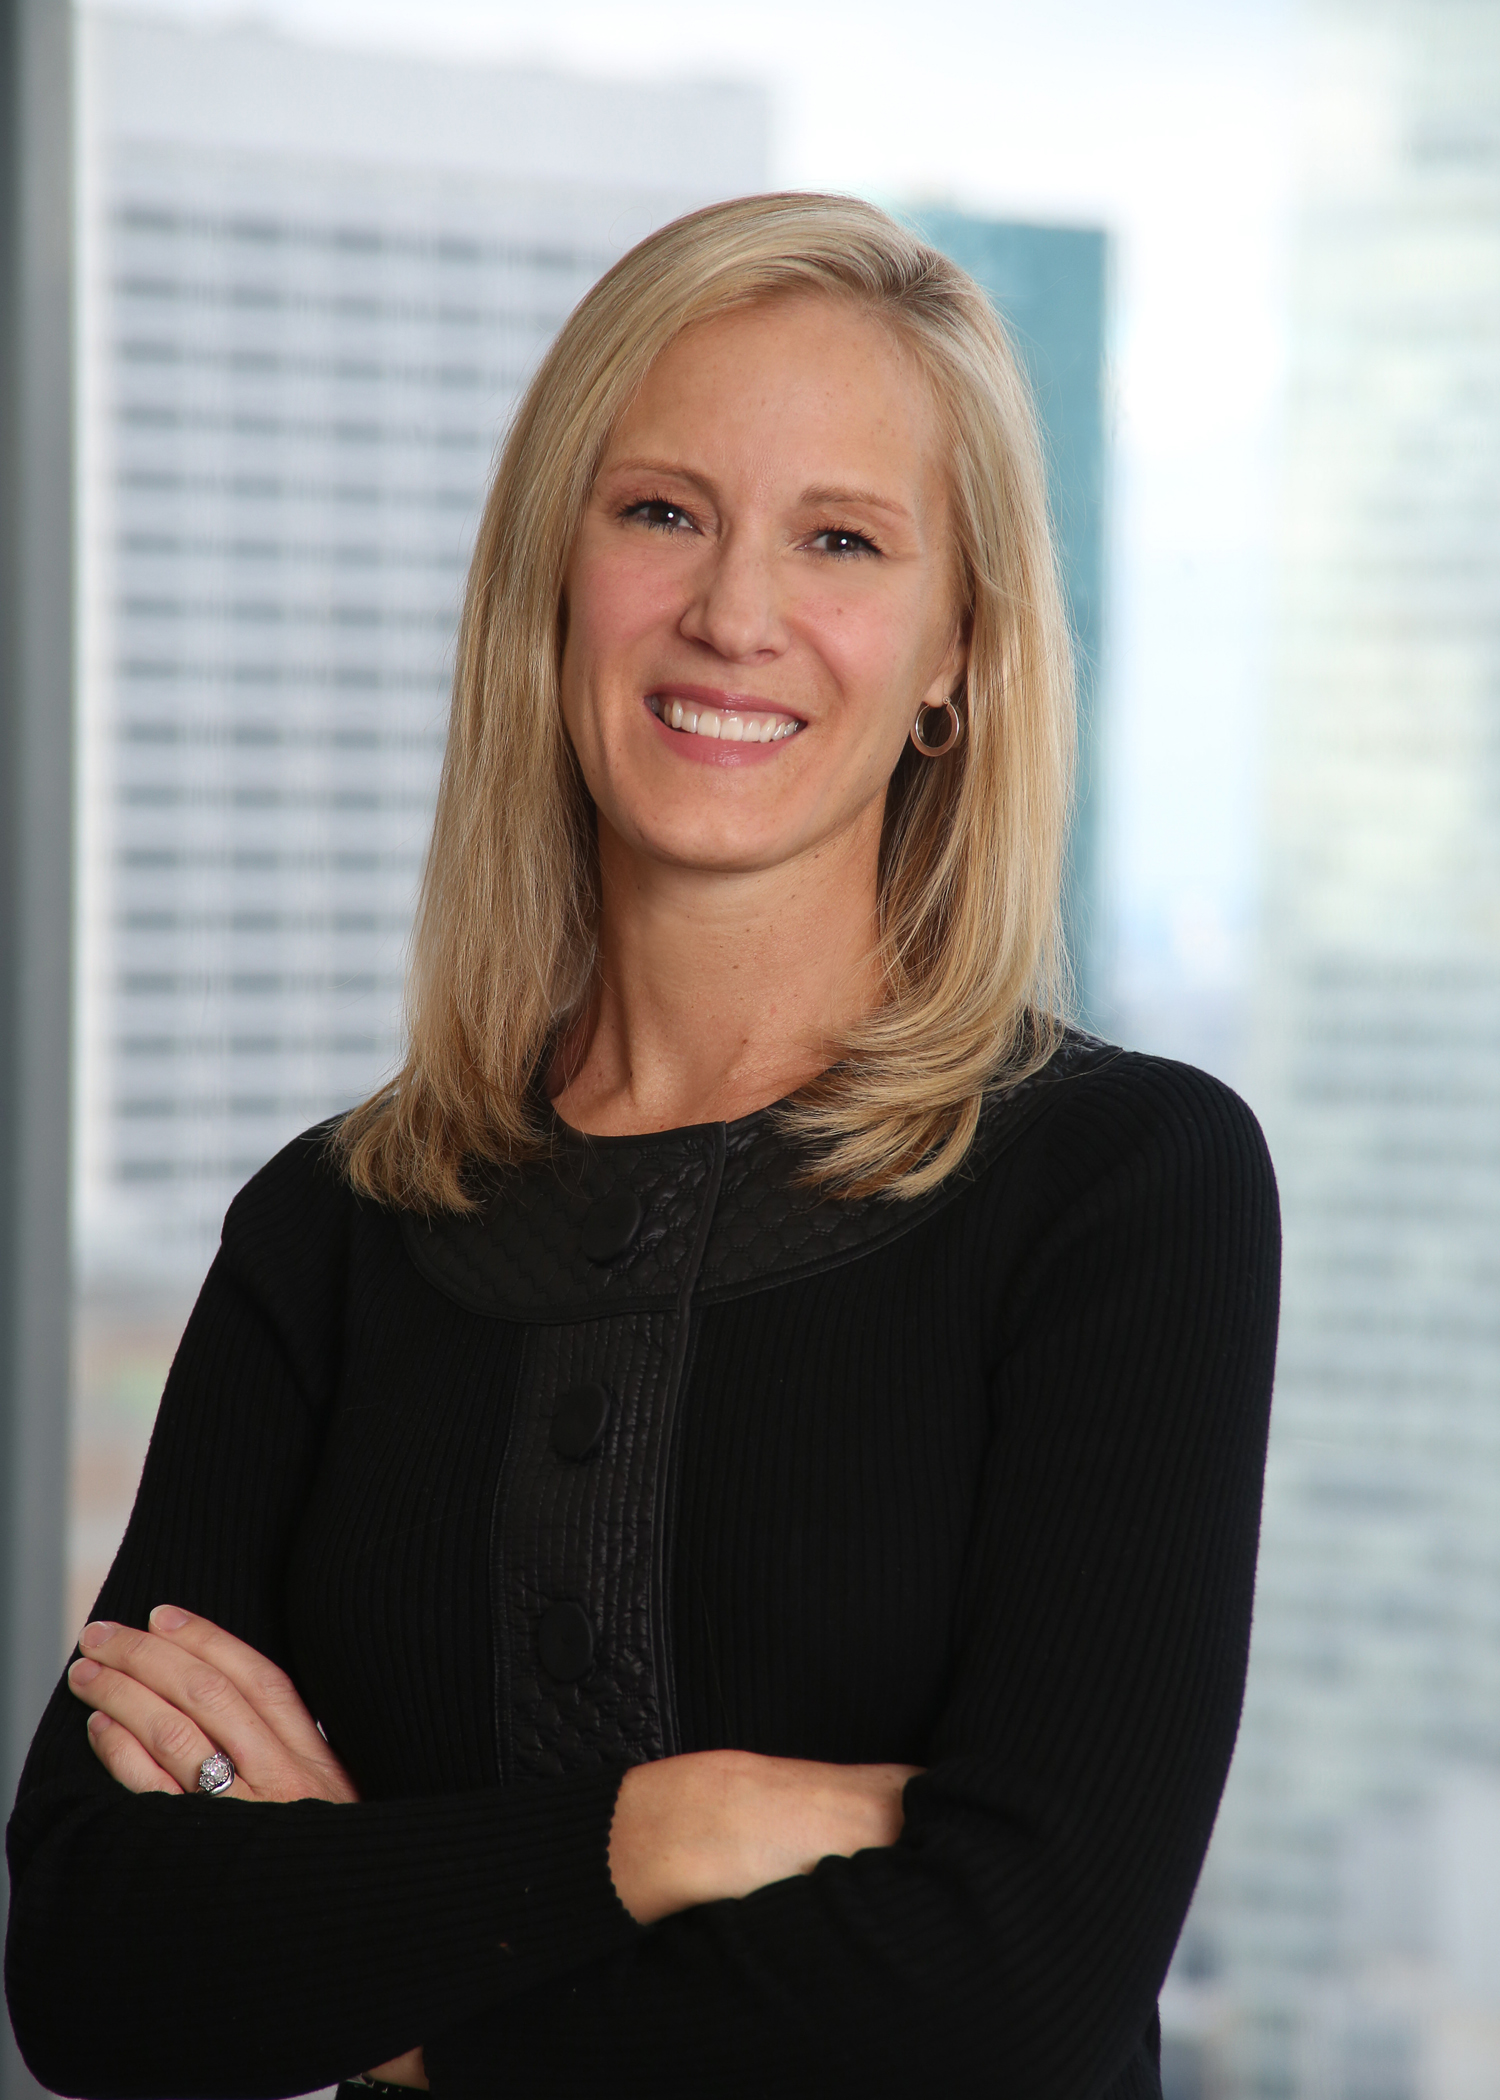 Kristin Lemkau, CMO of JPMorgan Chase